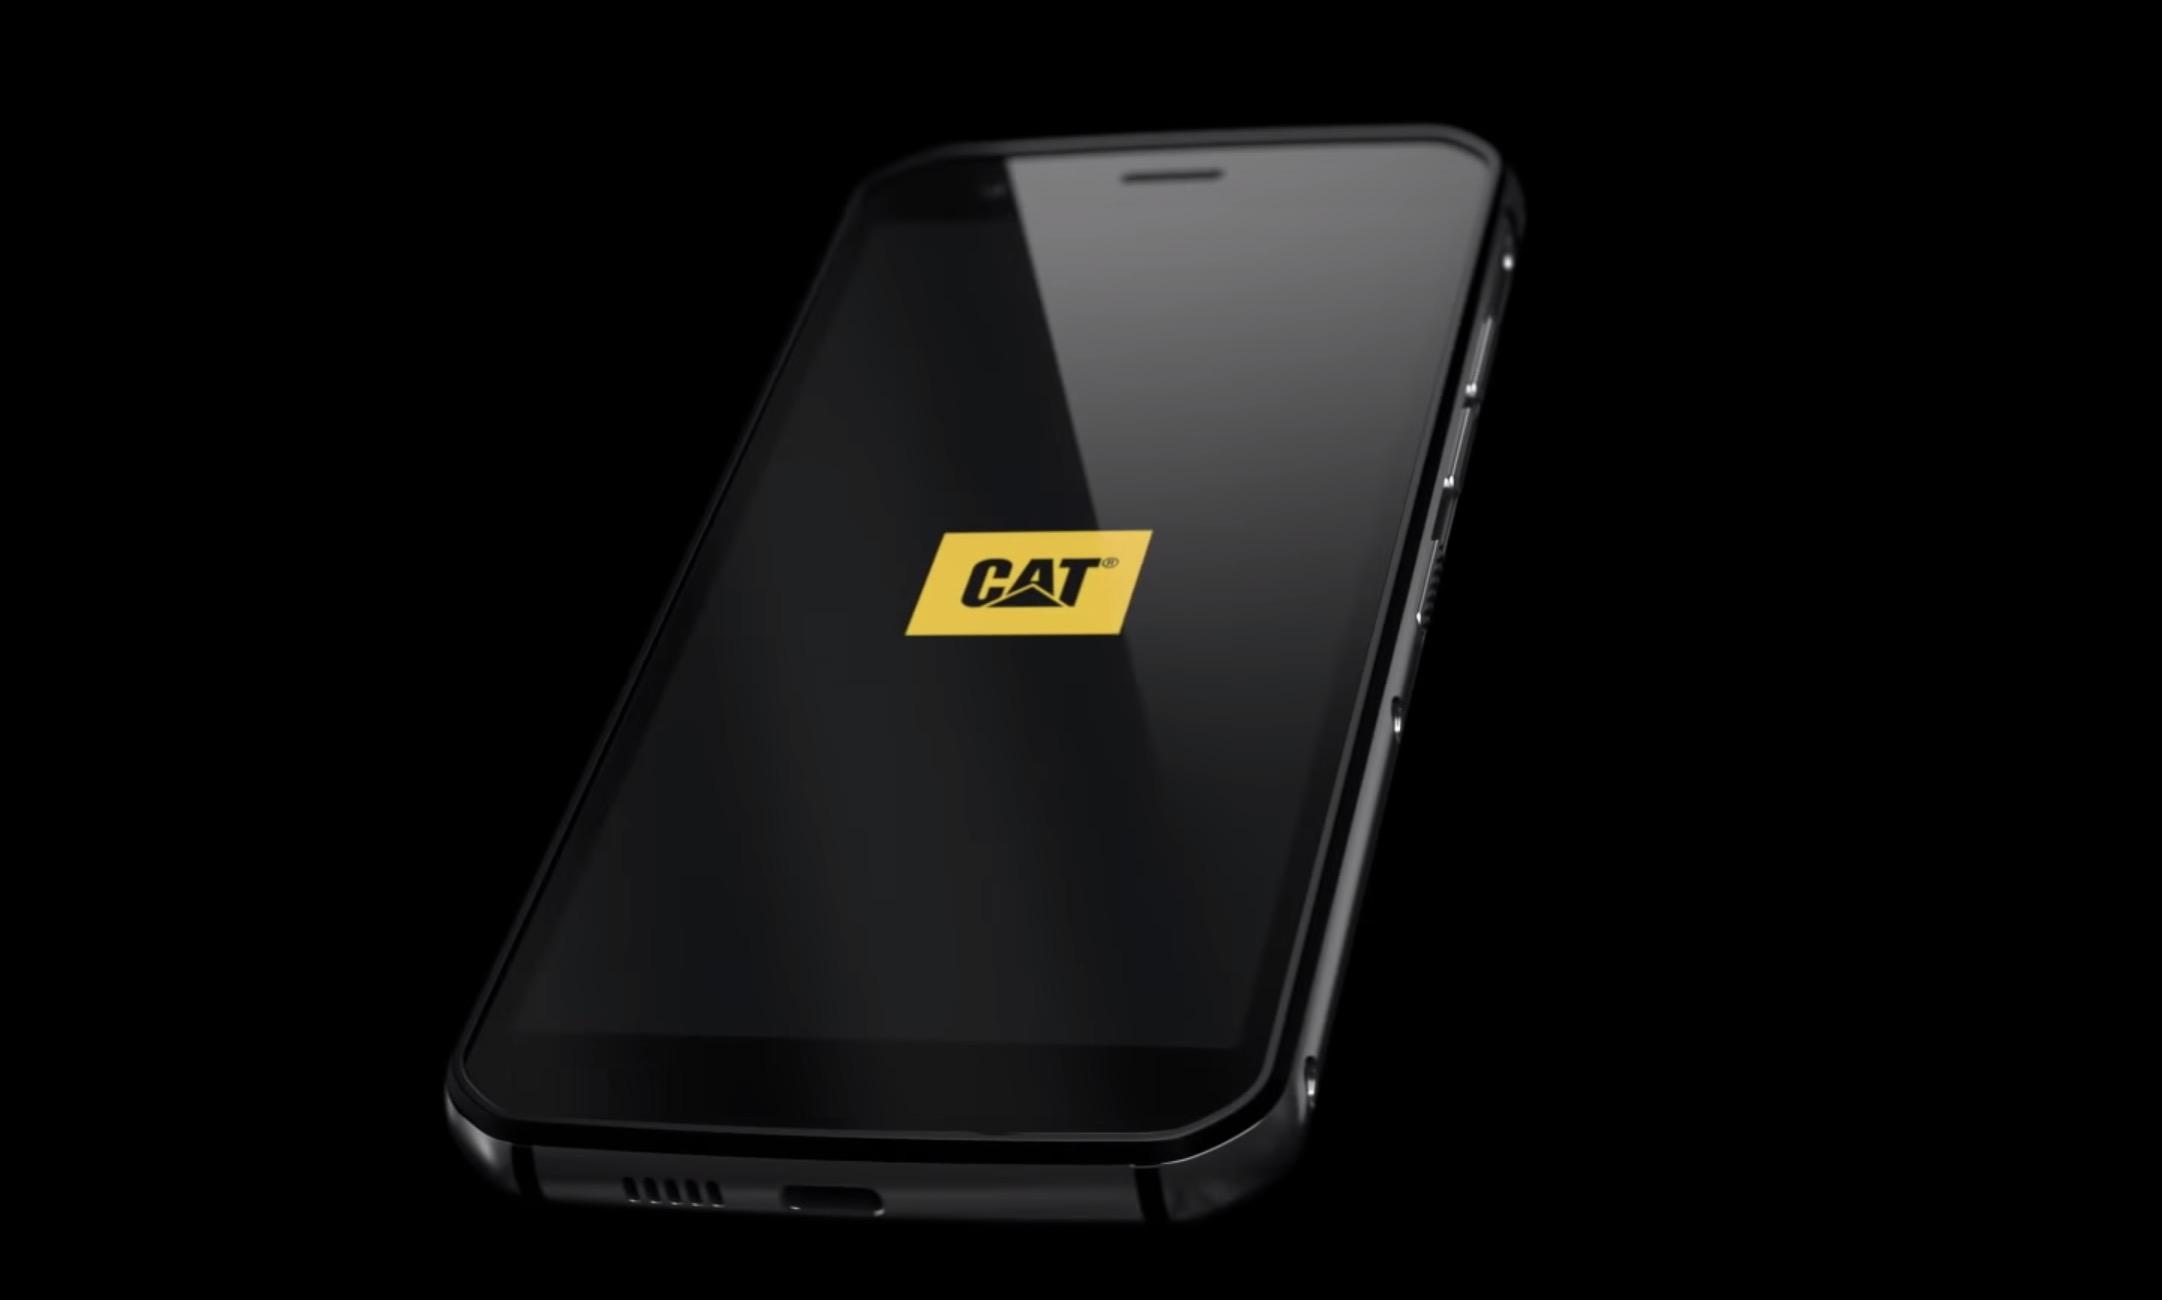 Cat mobil